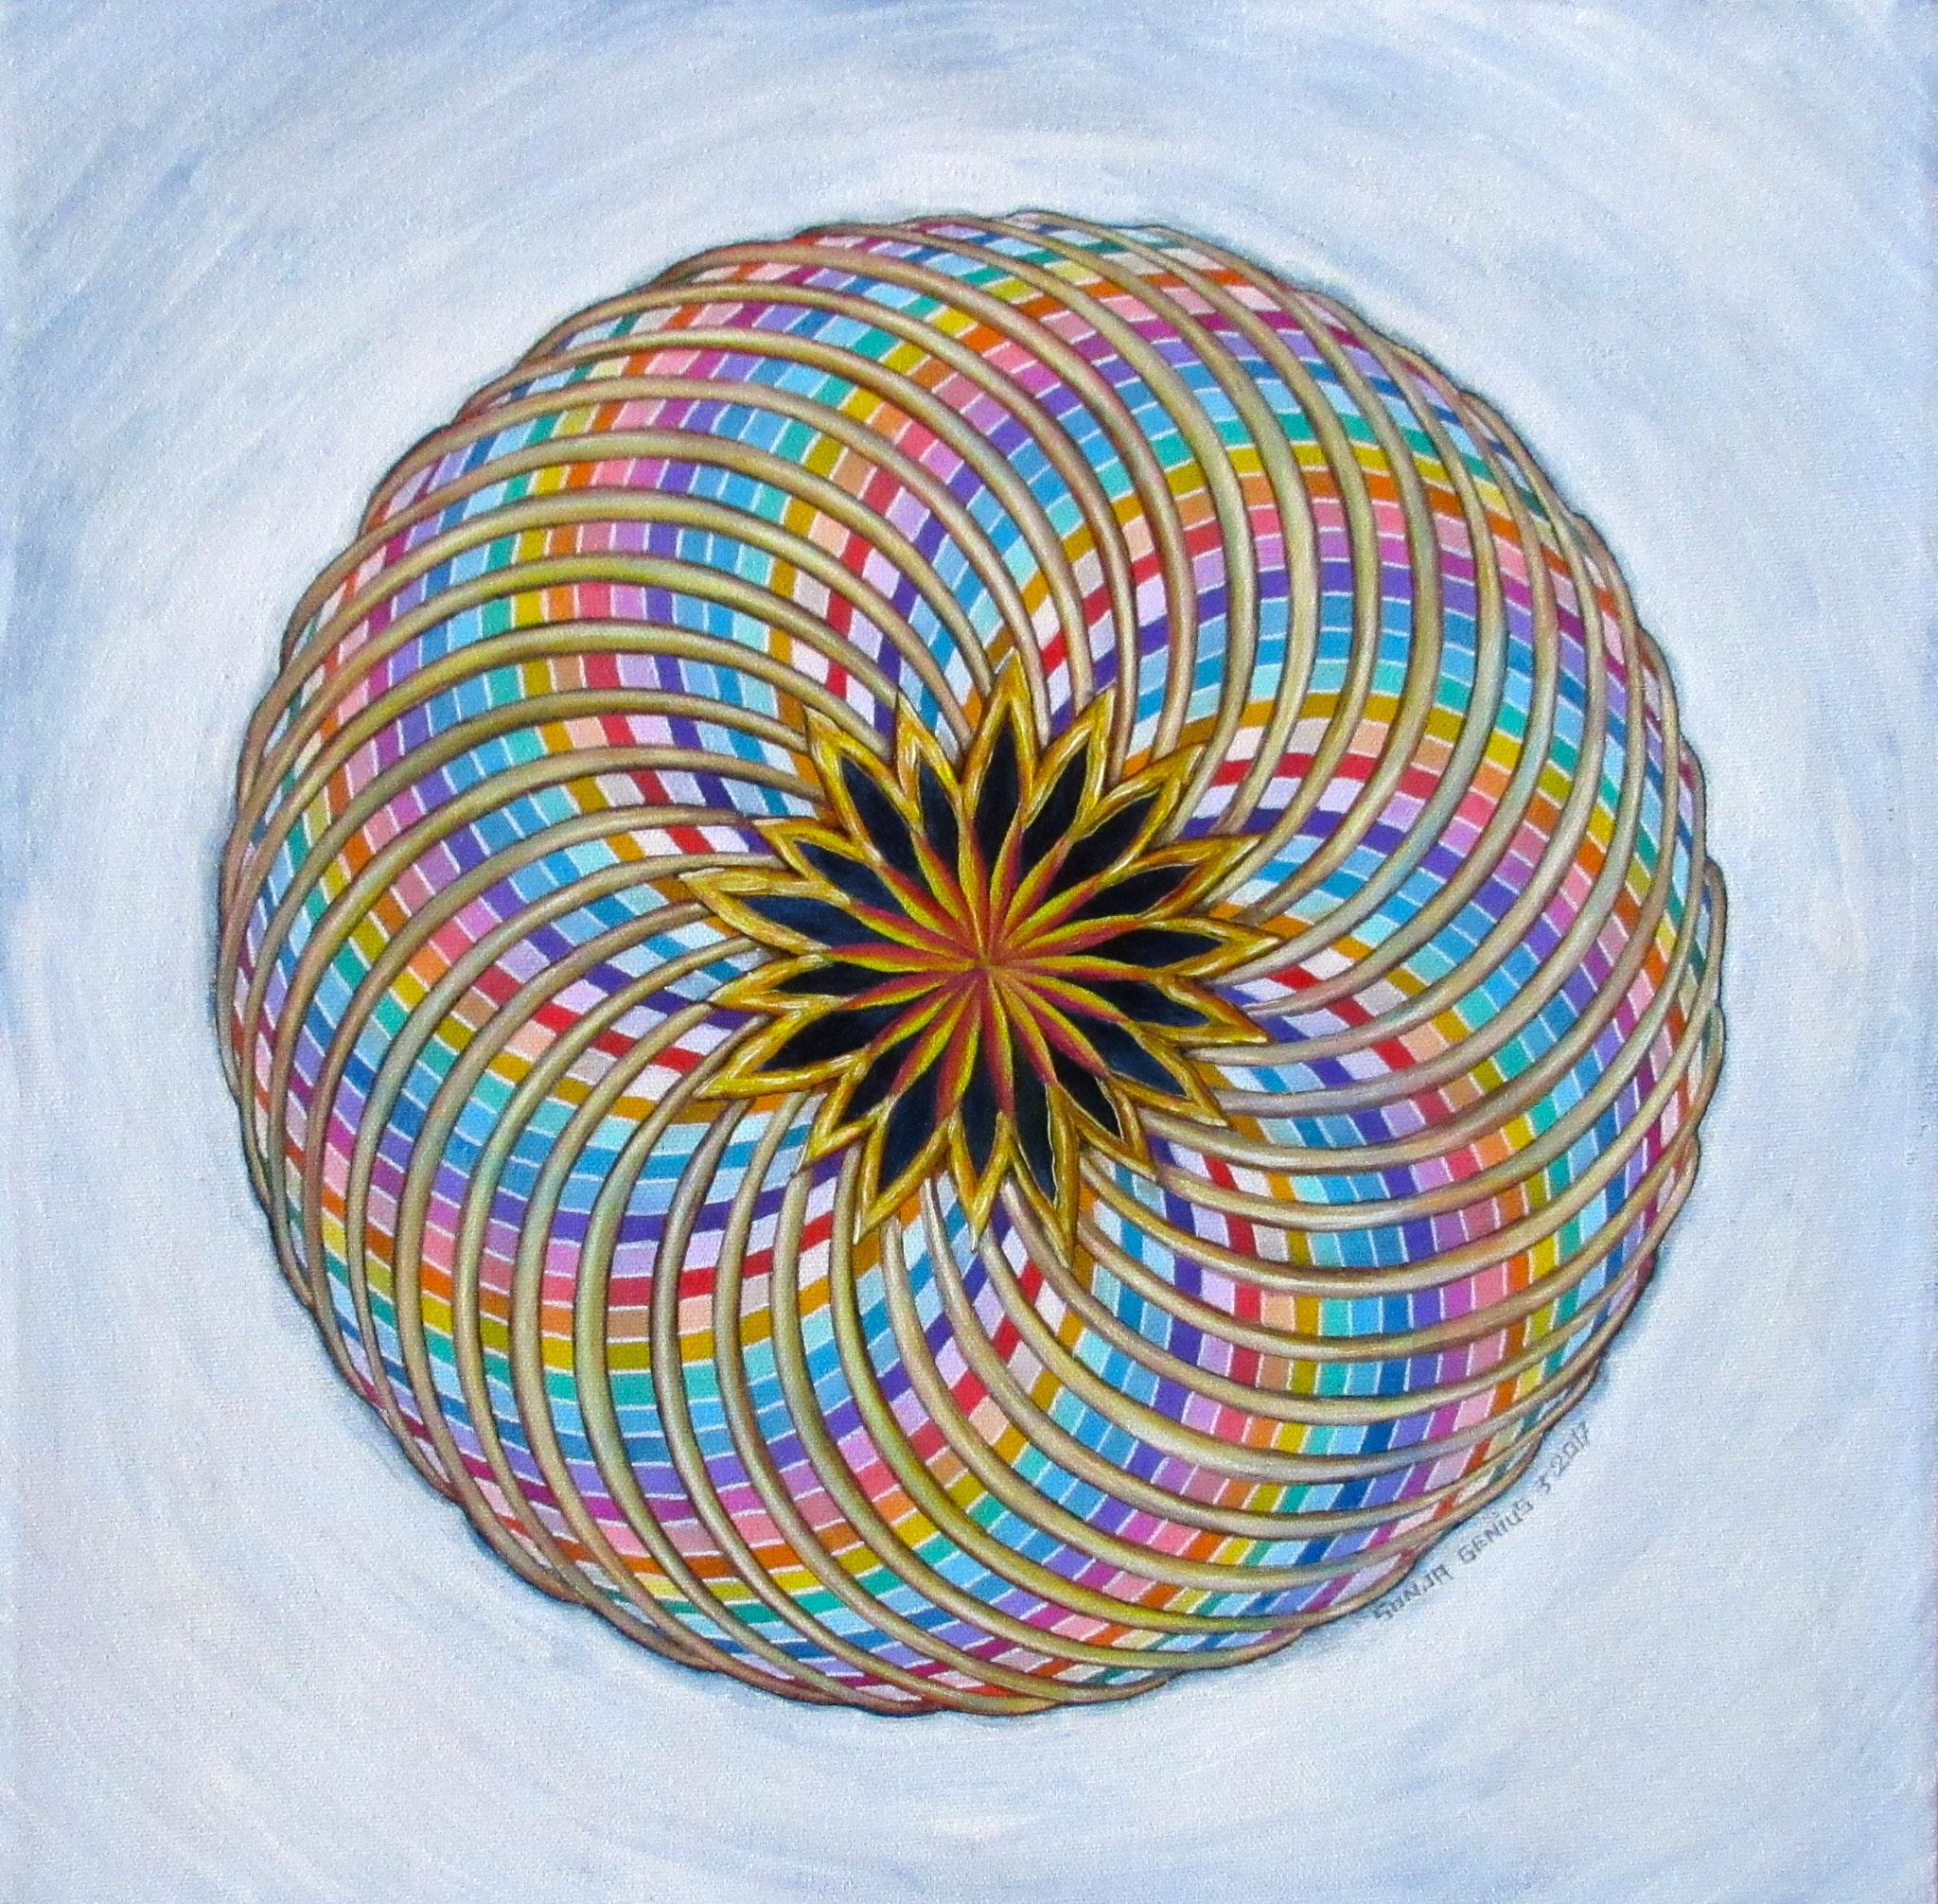 """Rainbow Torus"", oil on canvas 16x16, March 2017 (4)"